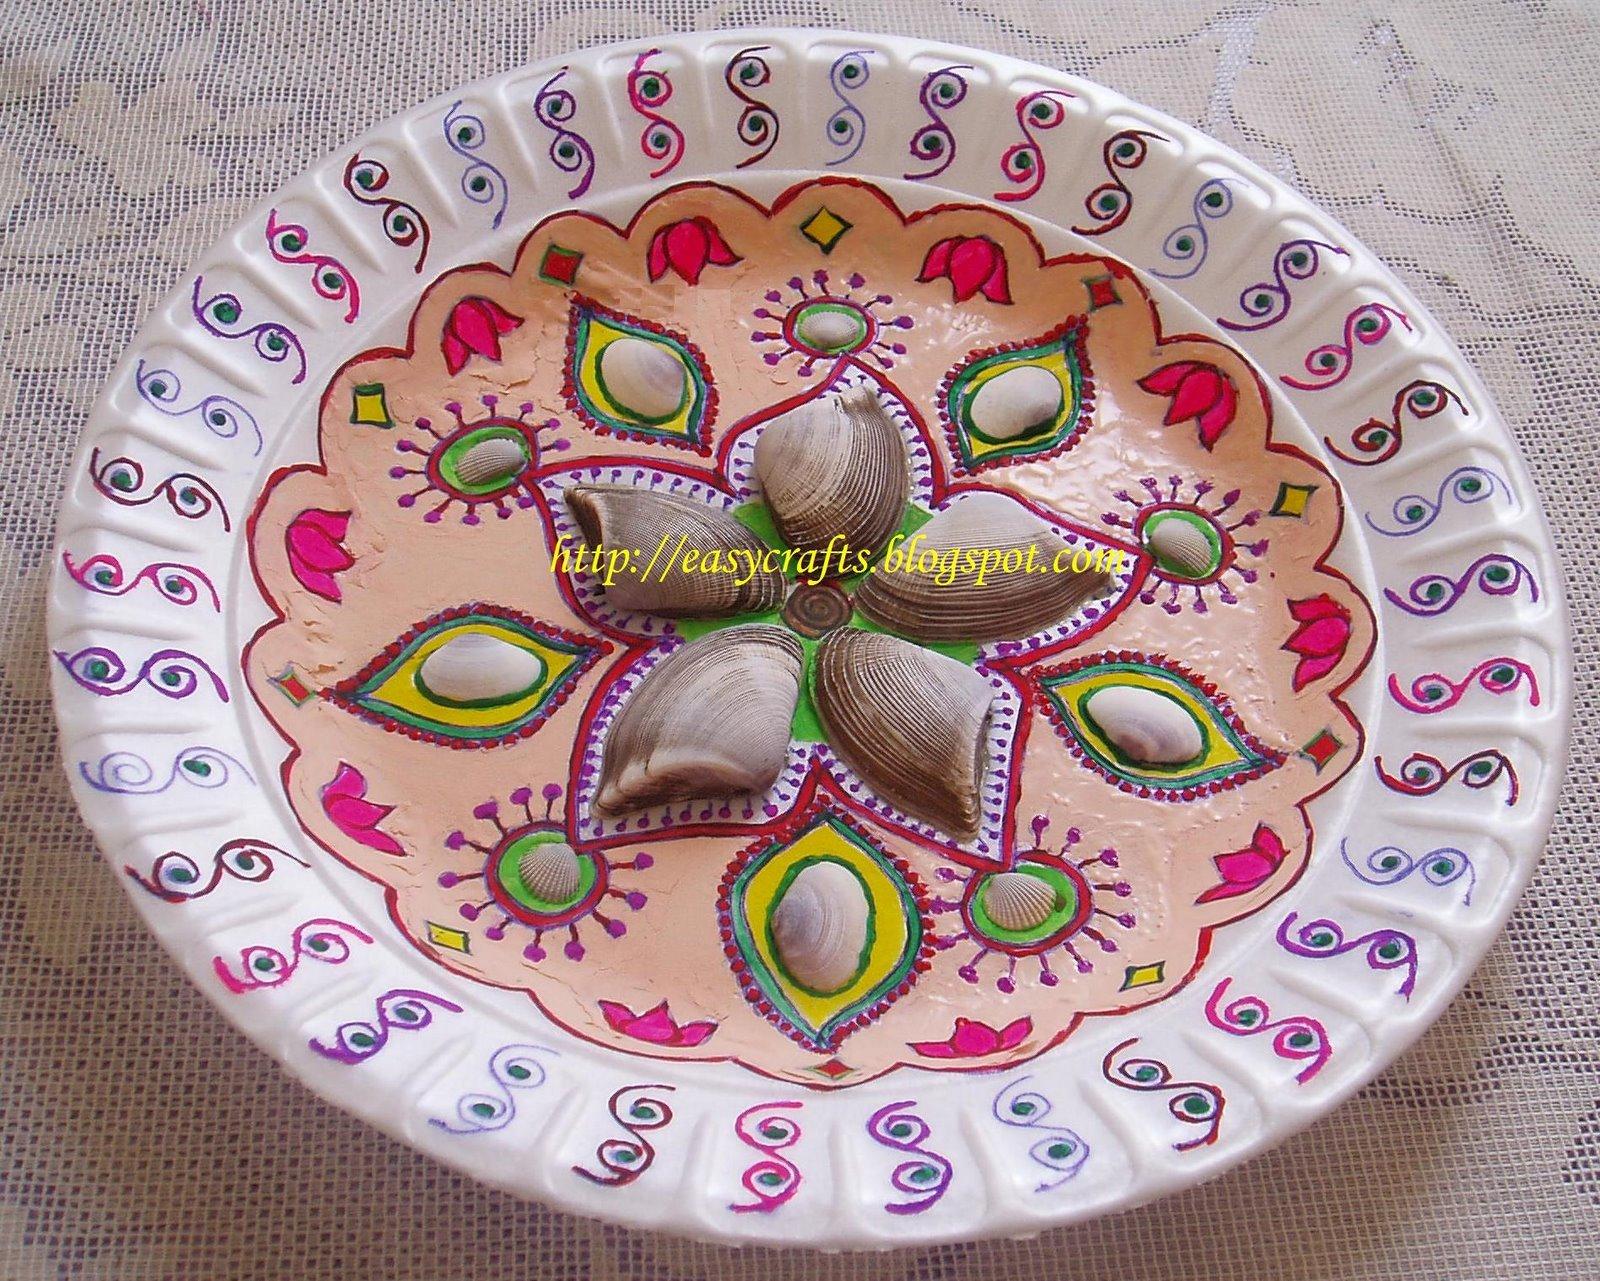 Easy crafts explore your creativity decorative plate for Arathi thattu decoration